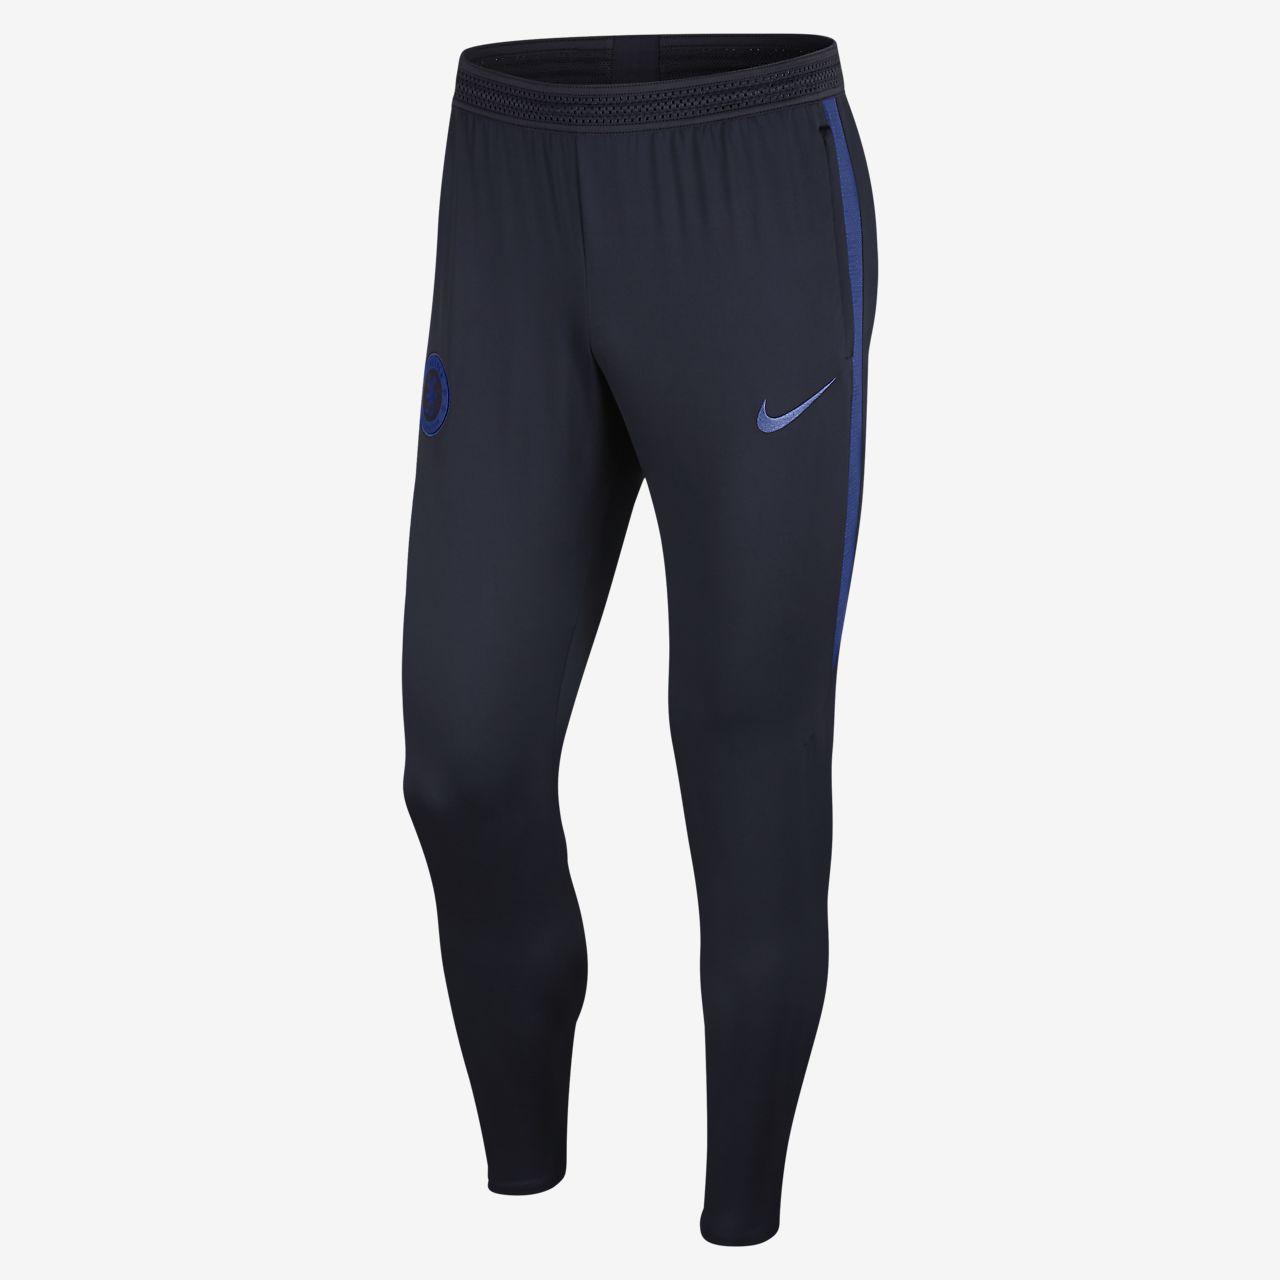 Dri Chelsea Fc Strike De Pour Pantalon Nike Fit Homme Football cTlF1JK3